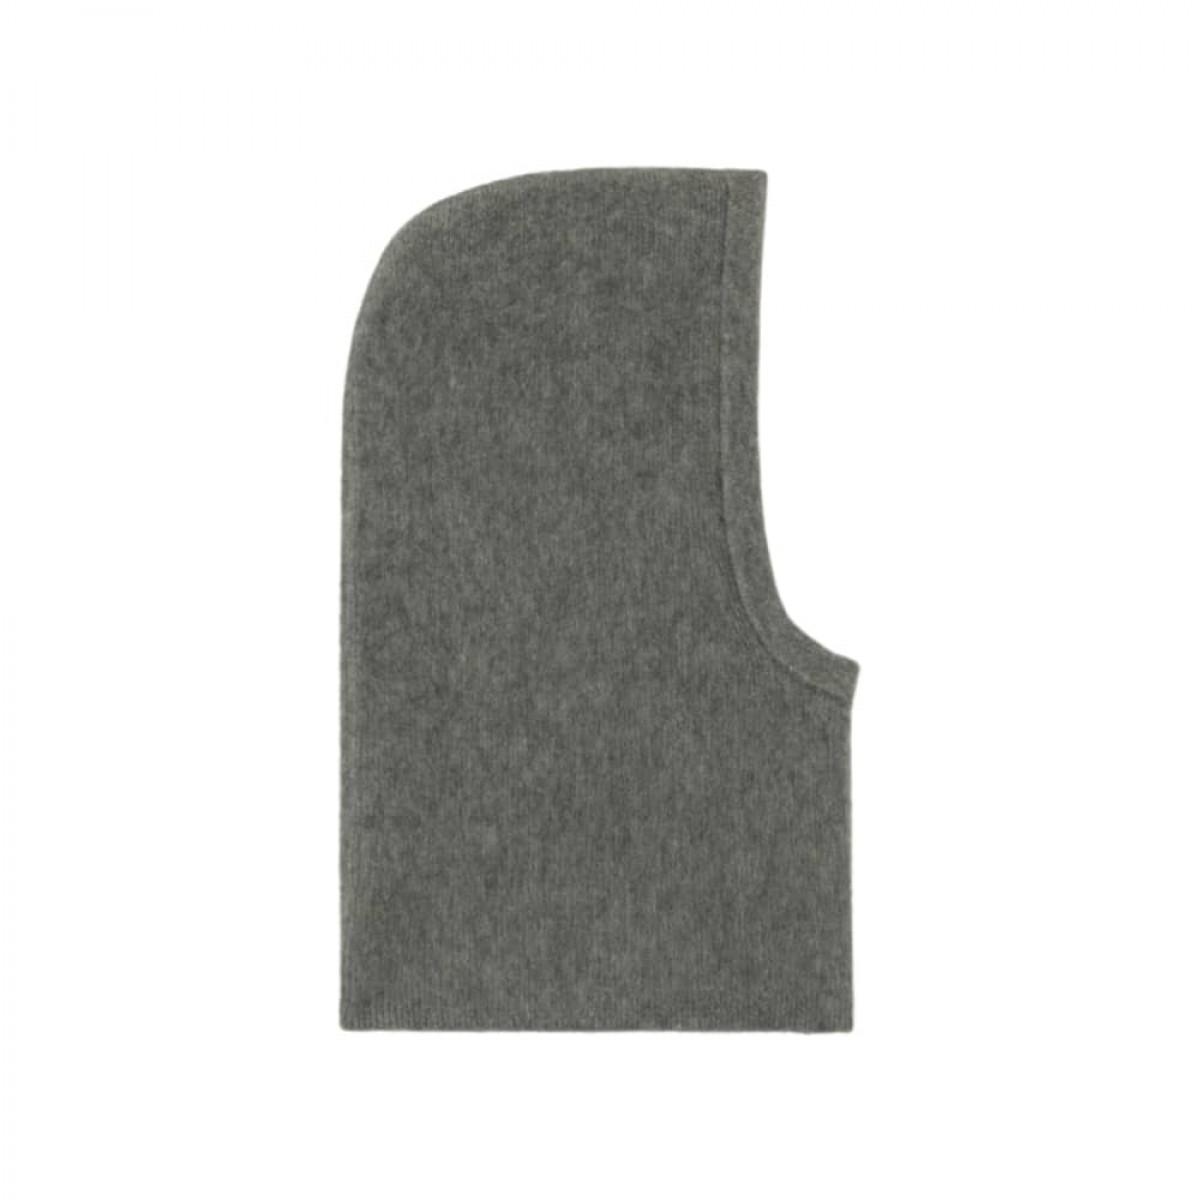 ozolittle hue - heather grey